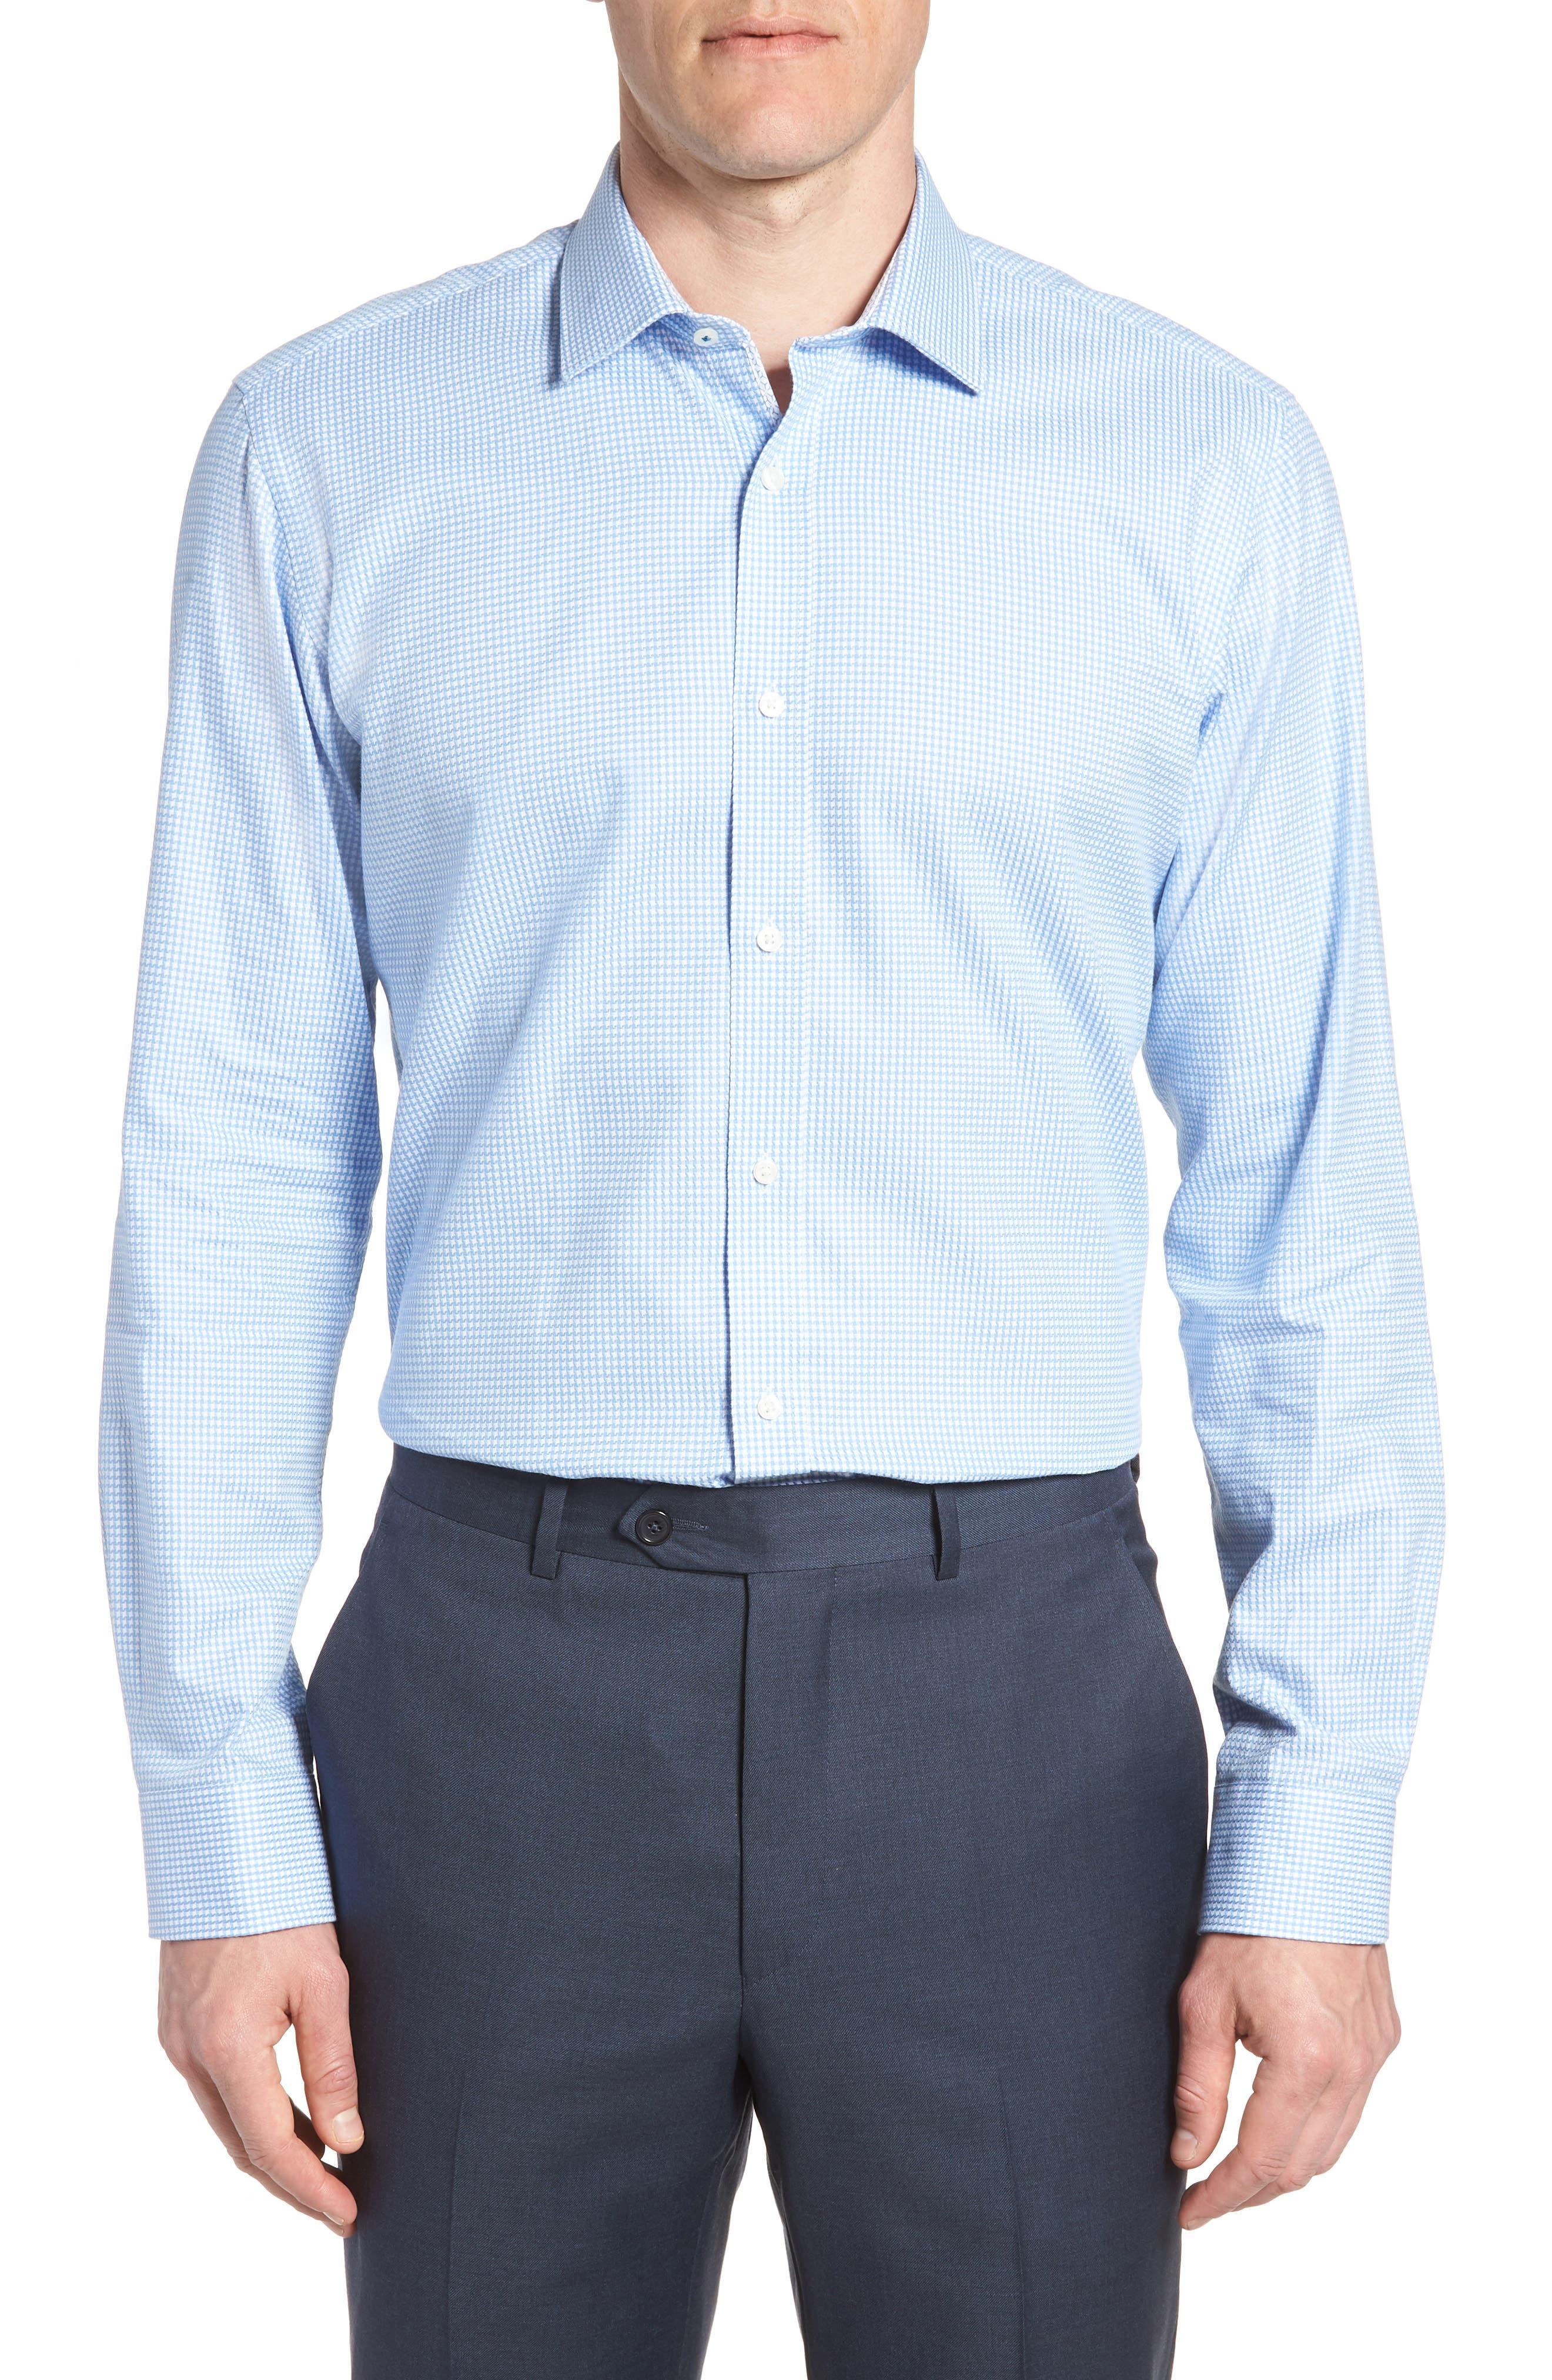 Jaiden Trim Fit Houndstooth Dress Shirt,                             Main thumbnail 1, color,                             Light Blue